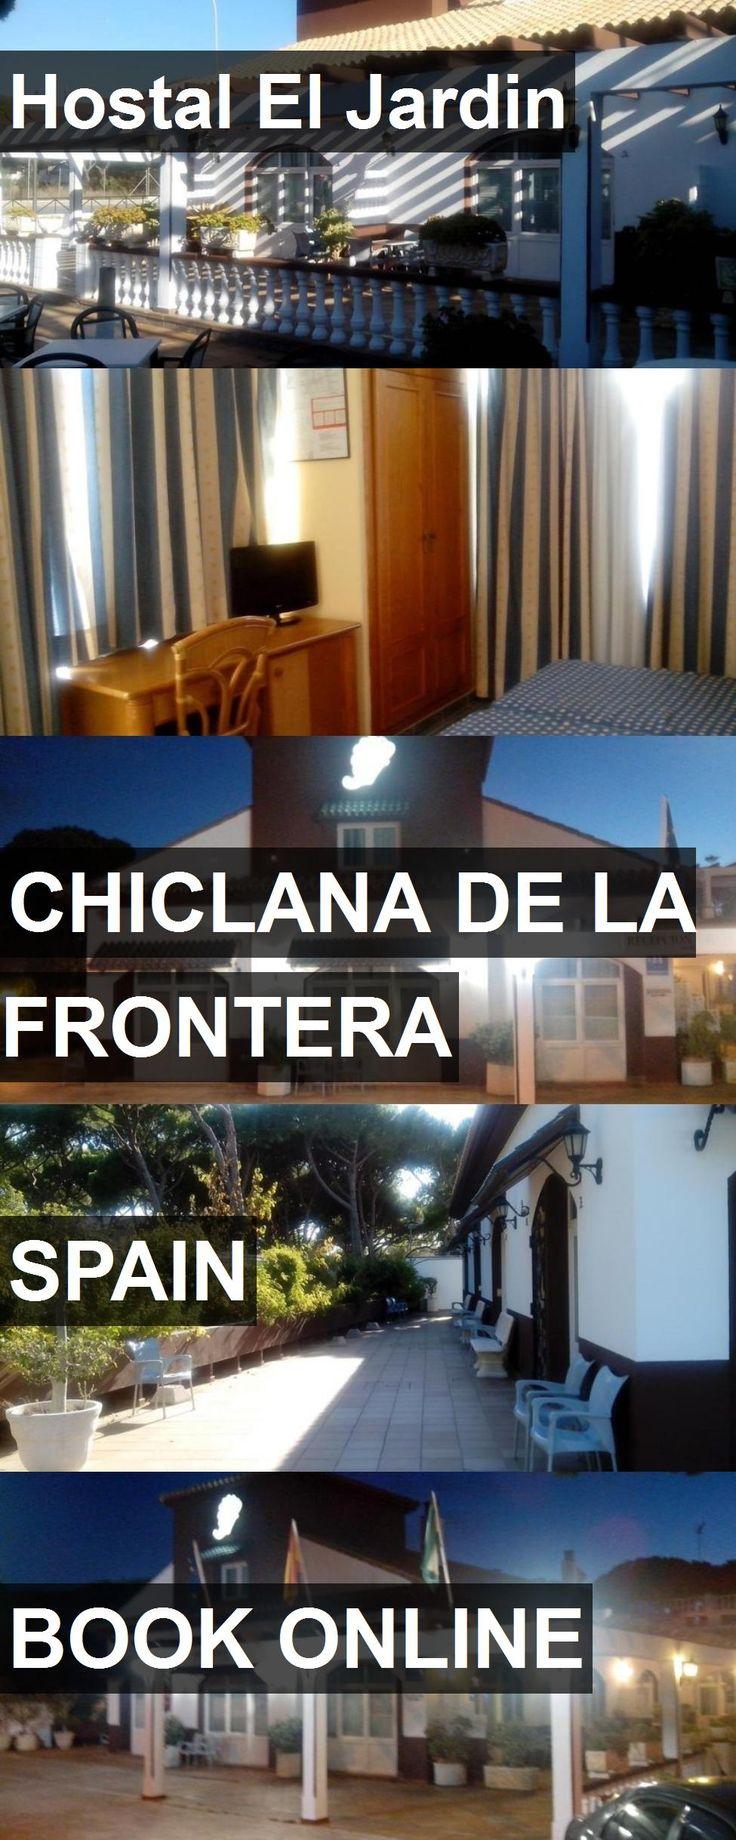 Hotel Hostal El Jardin in Chiclana de la Frontera, Spain. For more information, photos, reviews and best prices please follow the link. #Spain #ChiclanadelaFrontera #HostalElJardin #hotel #travel #vacation